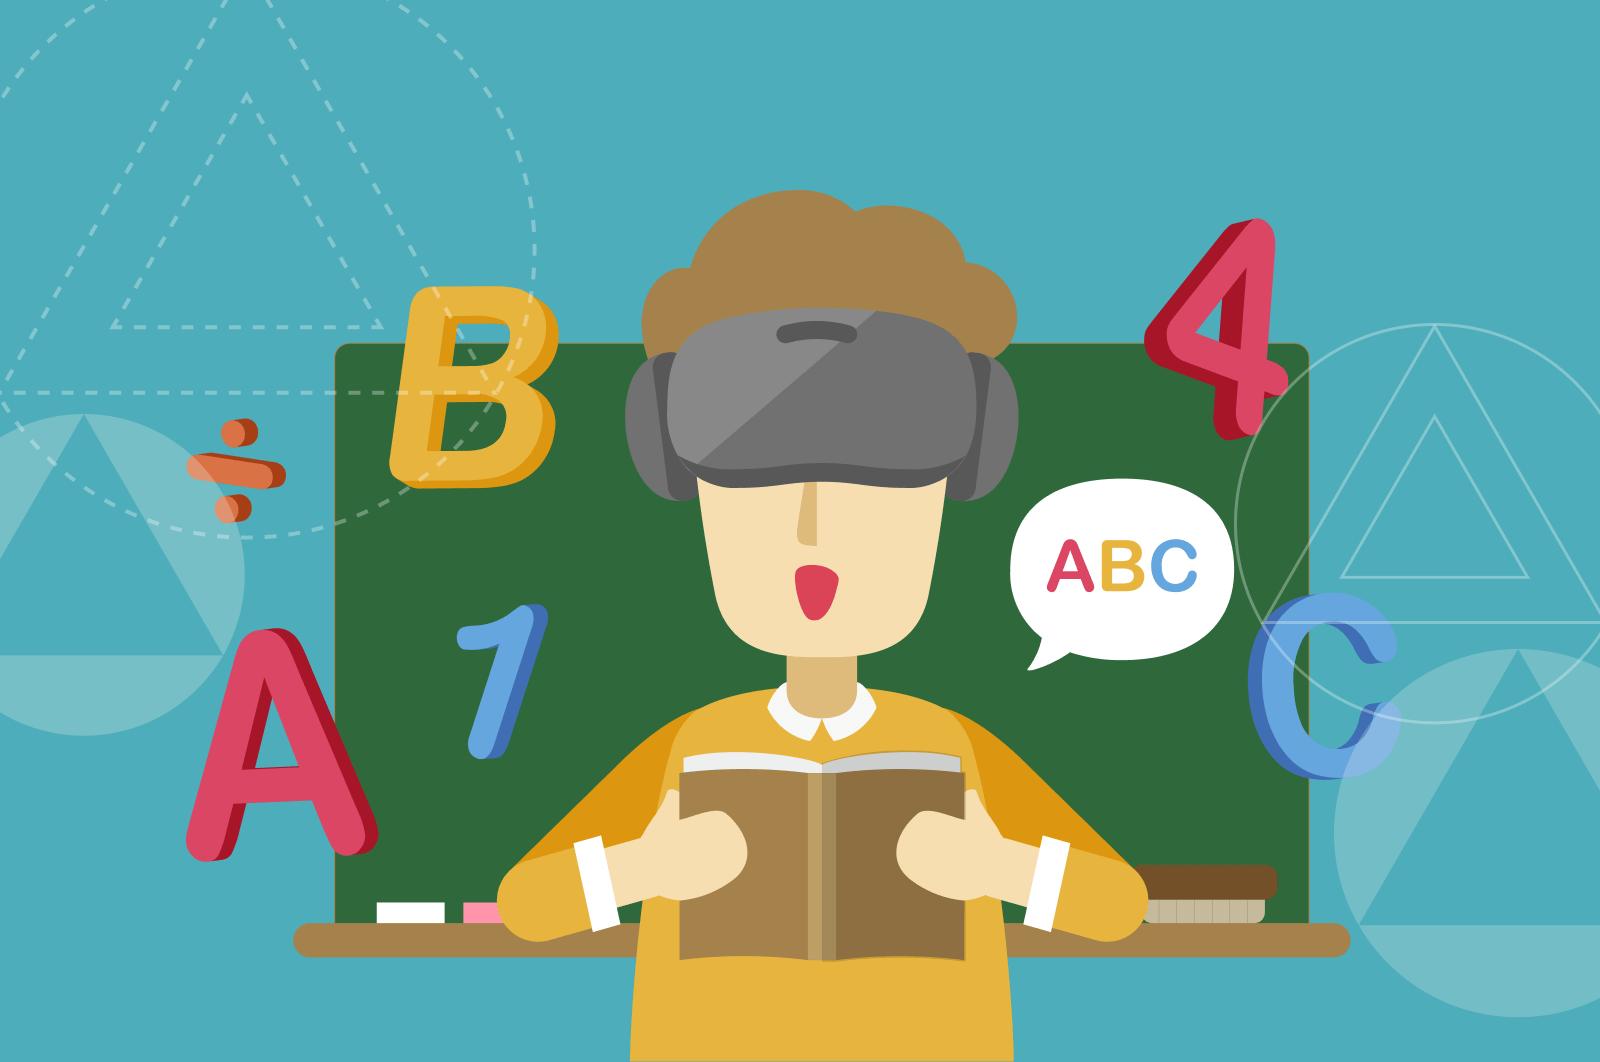 Топ 10-трендов онлайн образования 2019